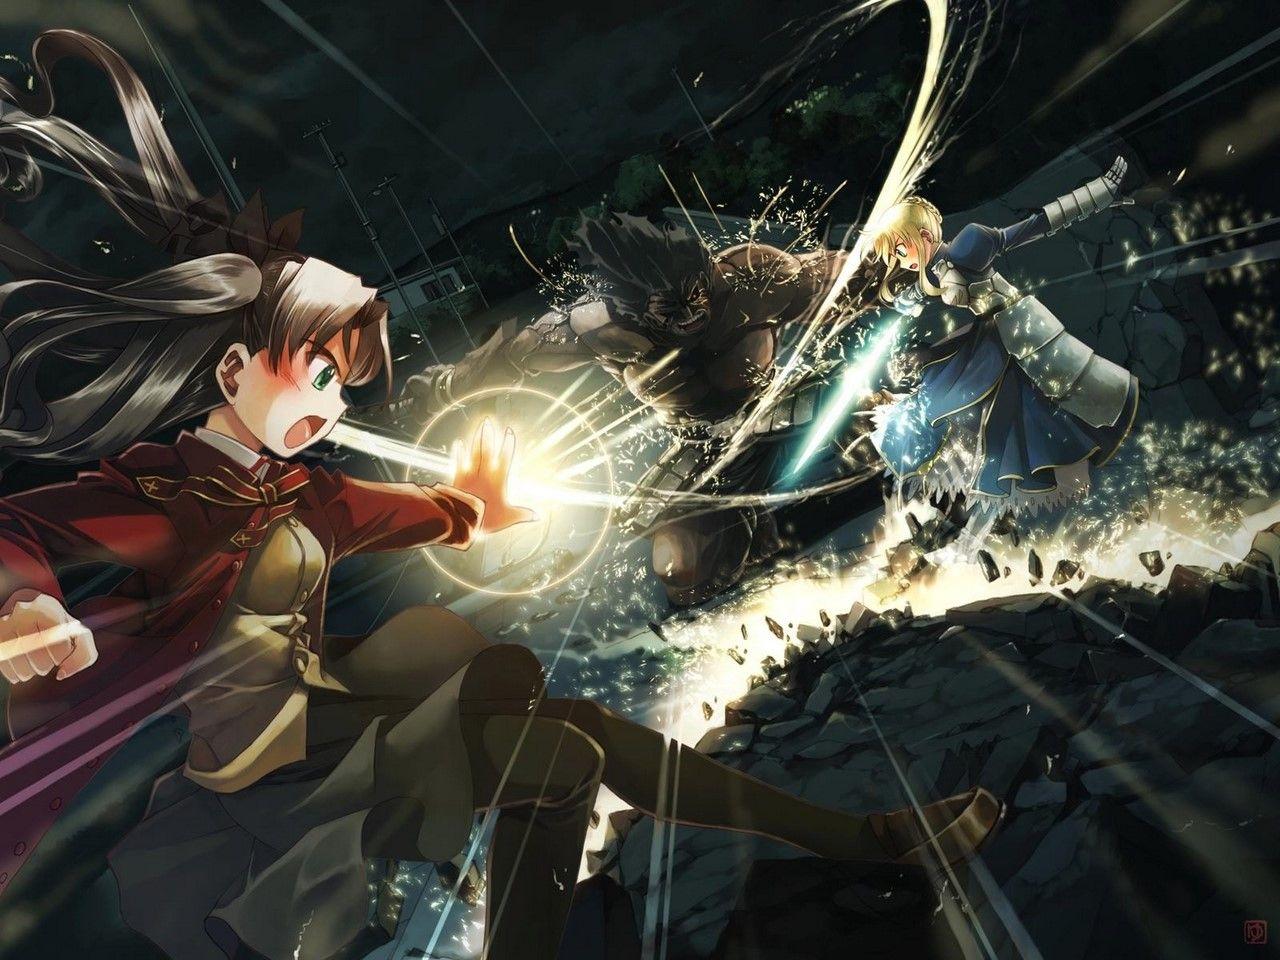 Pin de Emerson em Fate Series Rin tohsaka, Girls anime